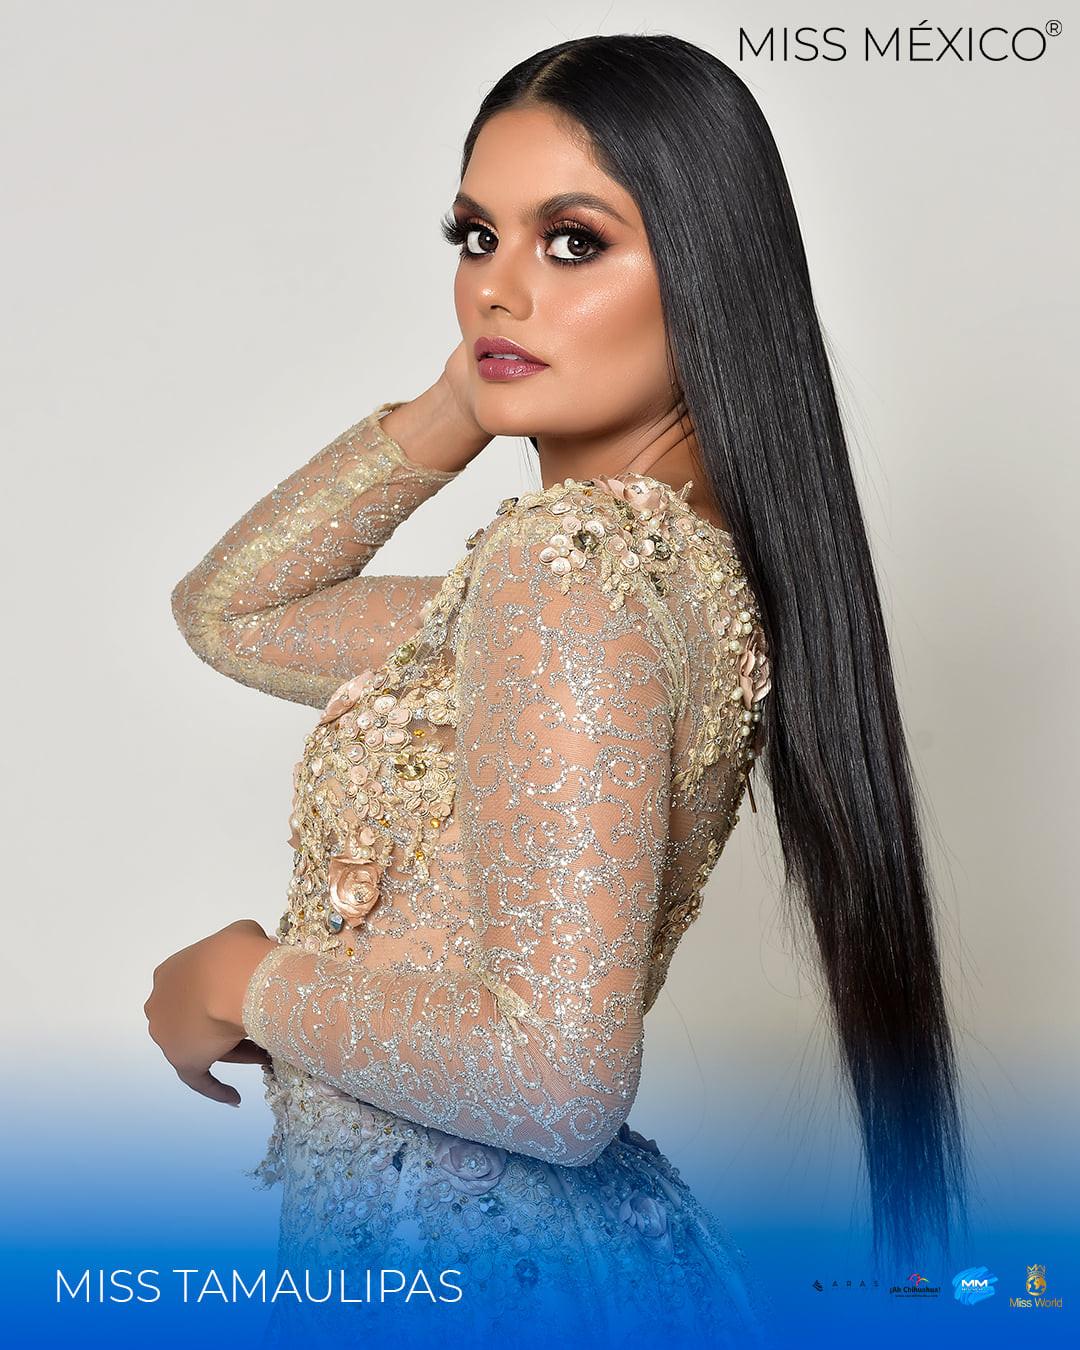 candidatas a miss mexico 2021, final: 3 july. - Página 13 Bm74J2